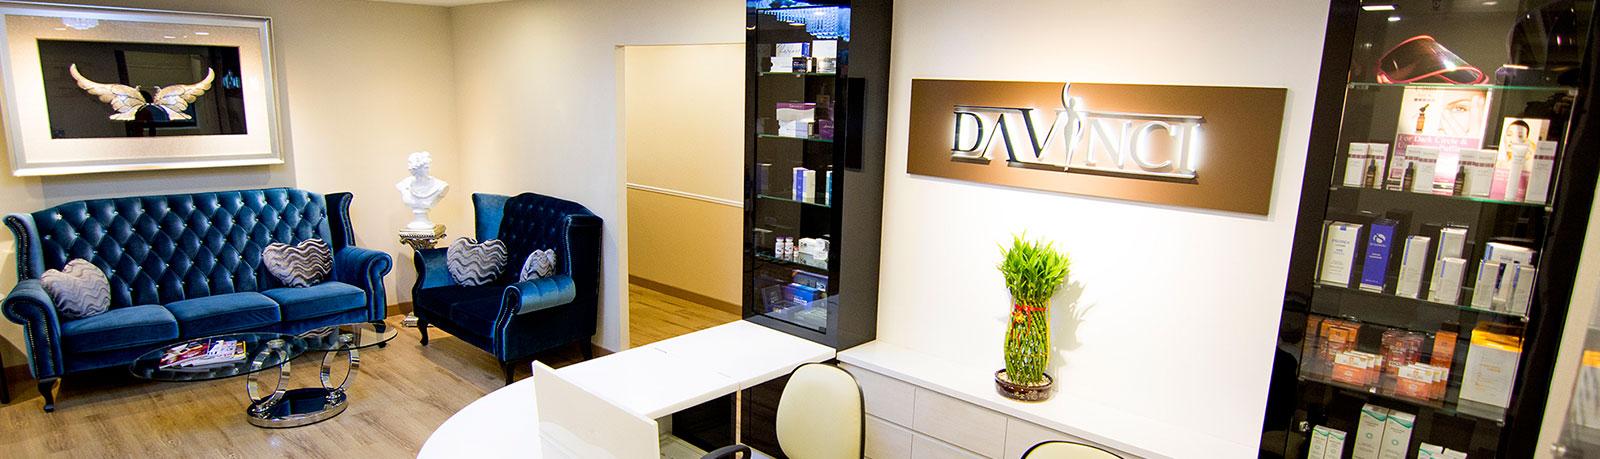 DaVinci Clinic Mid Valley-KL